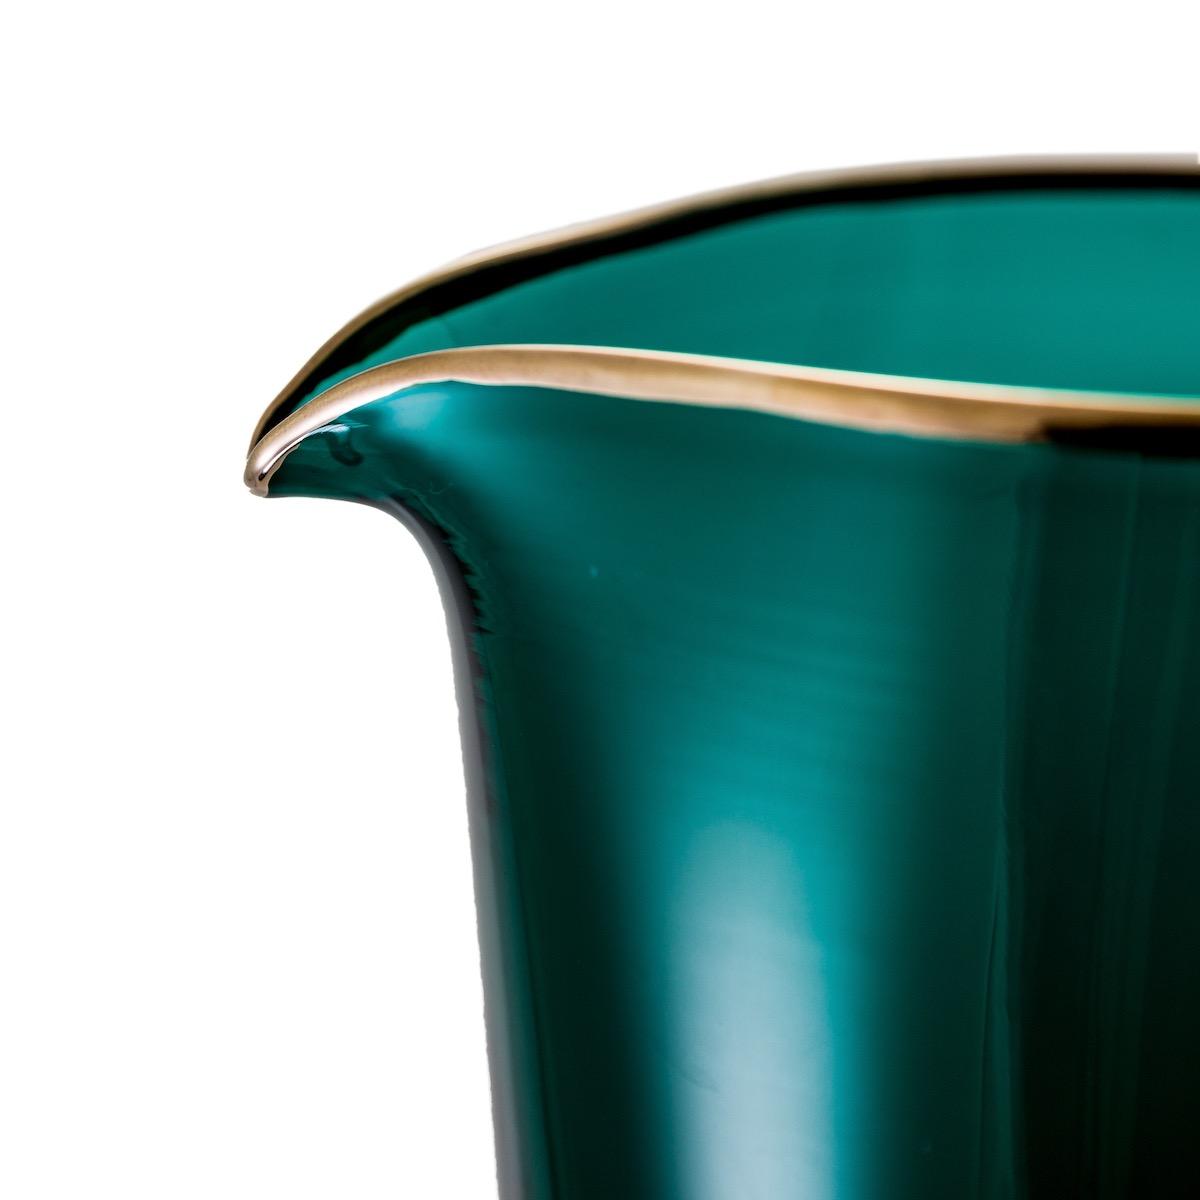 green-lola-viola-jug-platinum-round-colorful-murano